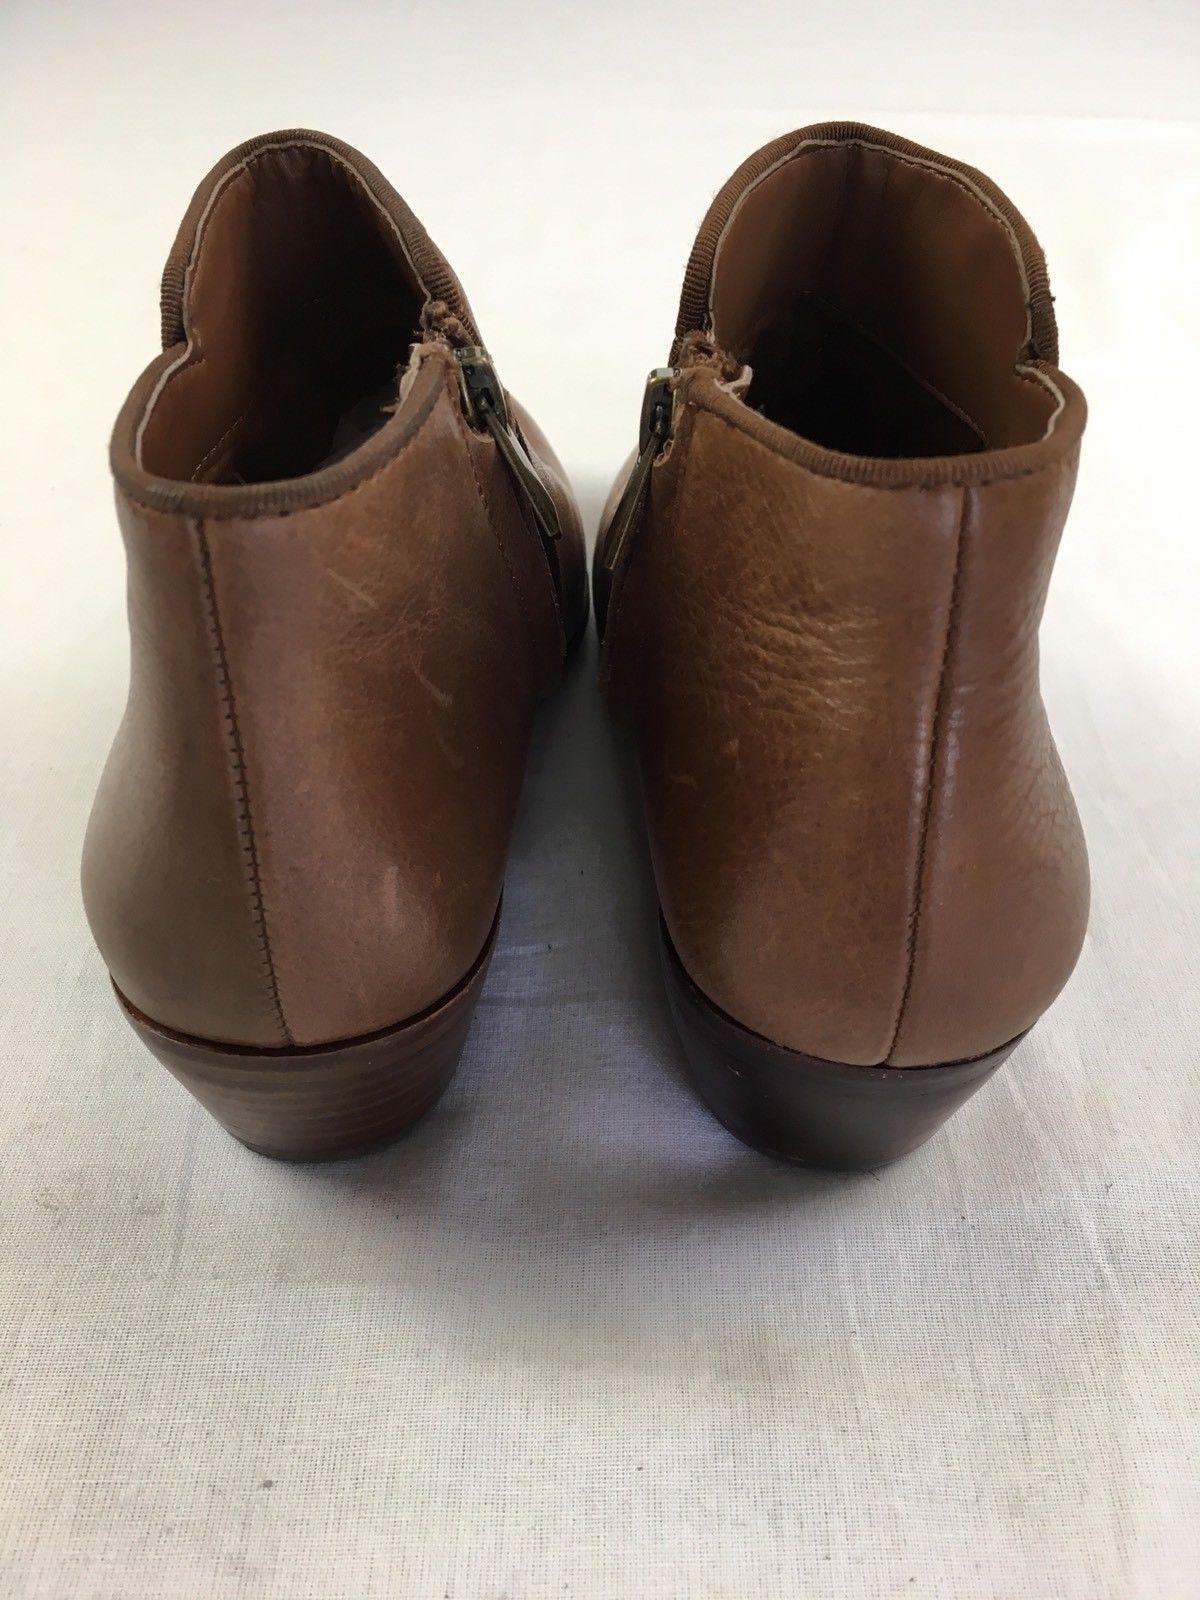 658e1fe00bde SAM EDELMAN Sale Petty Chelsea Ankle Boots Bootie Brown Leather 5.5 MISMATCH